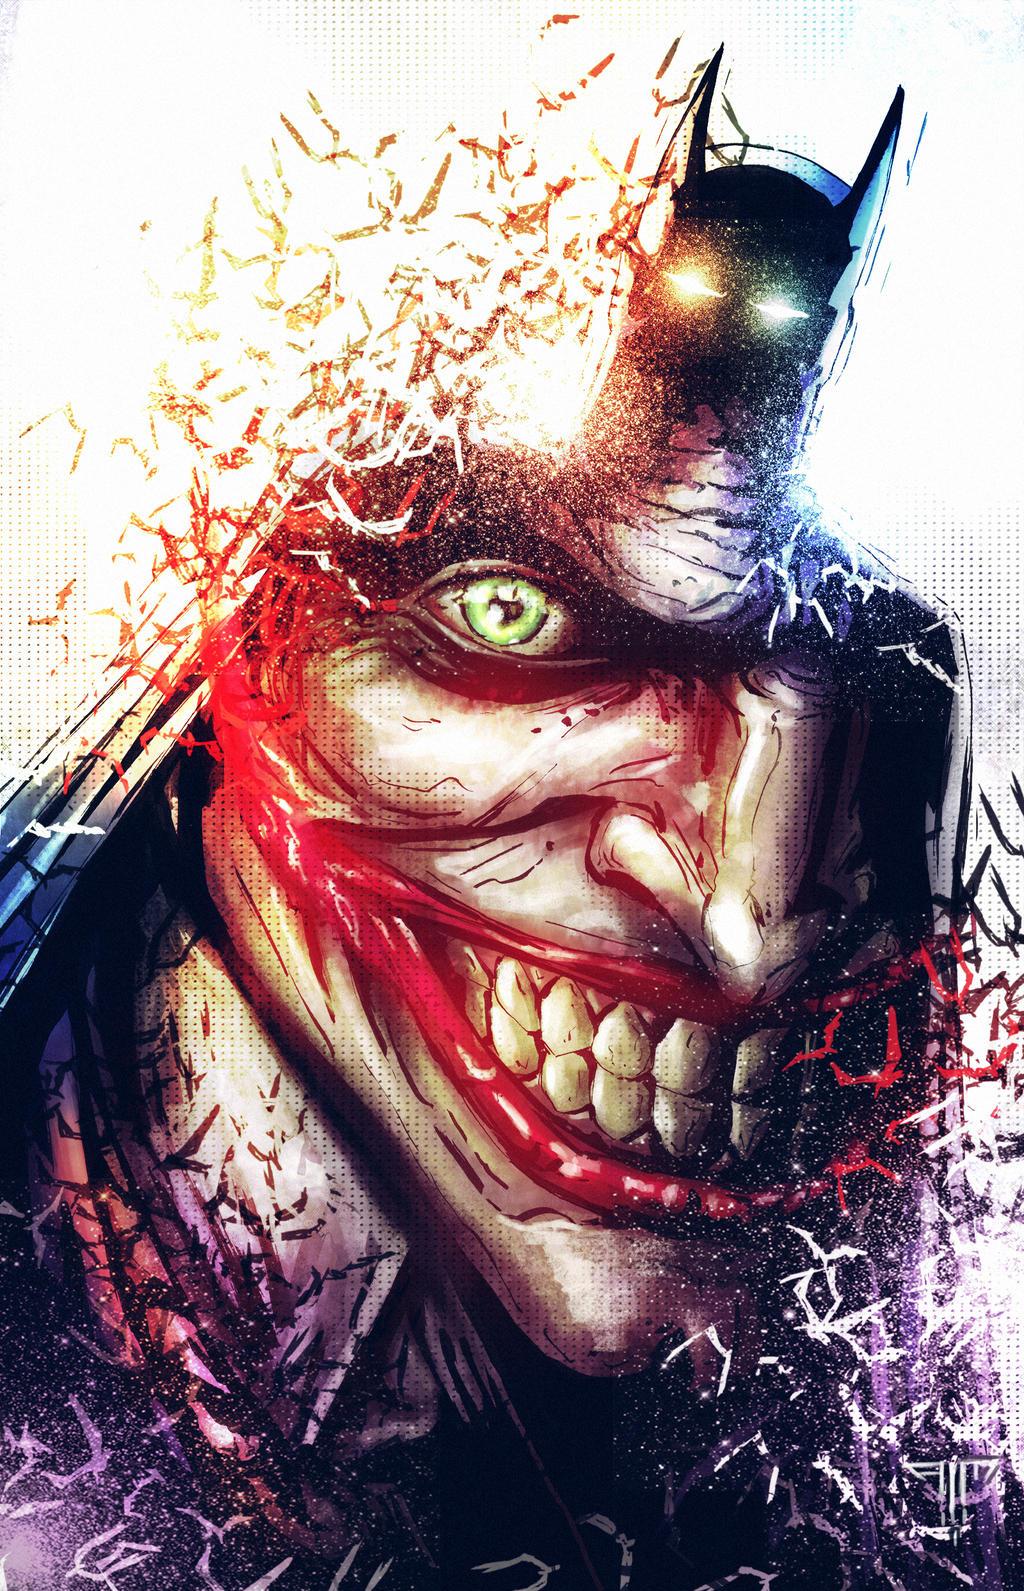 http://img15.deviantart.net/af41/i/2015/191/f/b/the_joker_by_aim_art-d90lm2c.jpg Comic Joker Painting